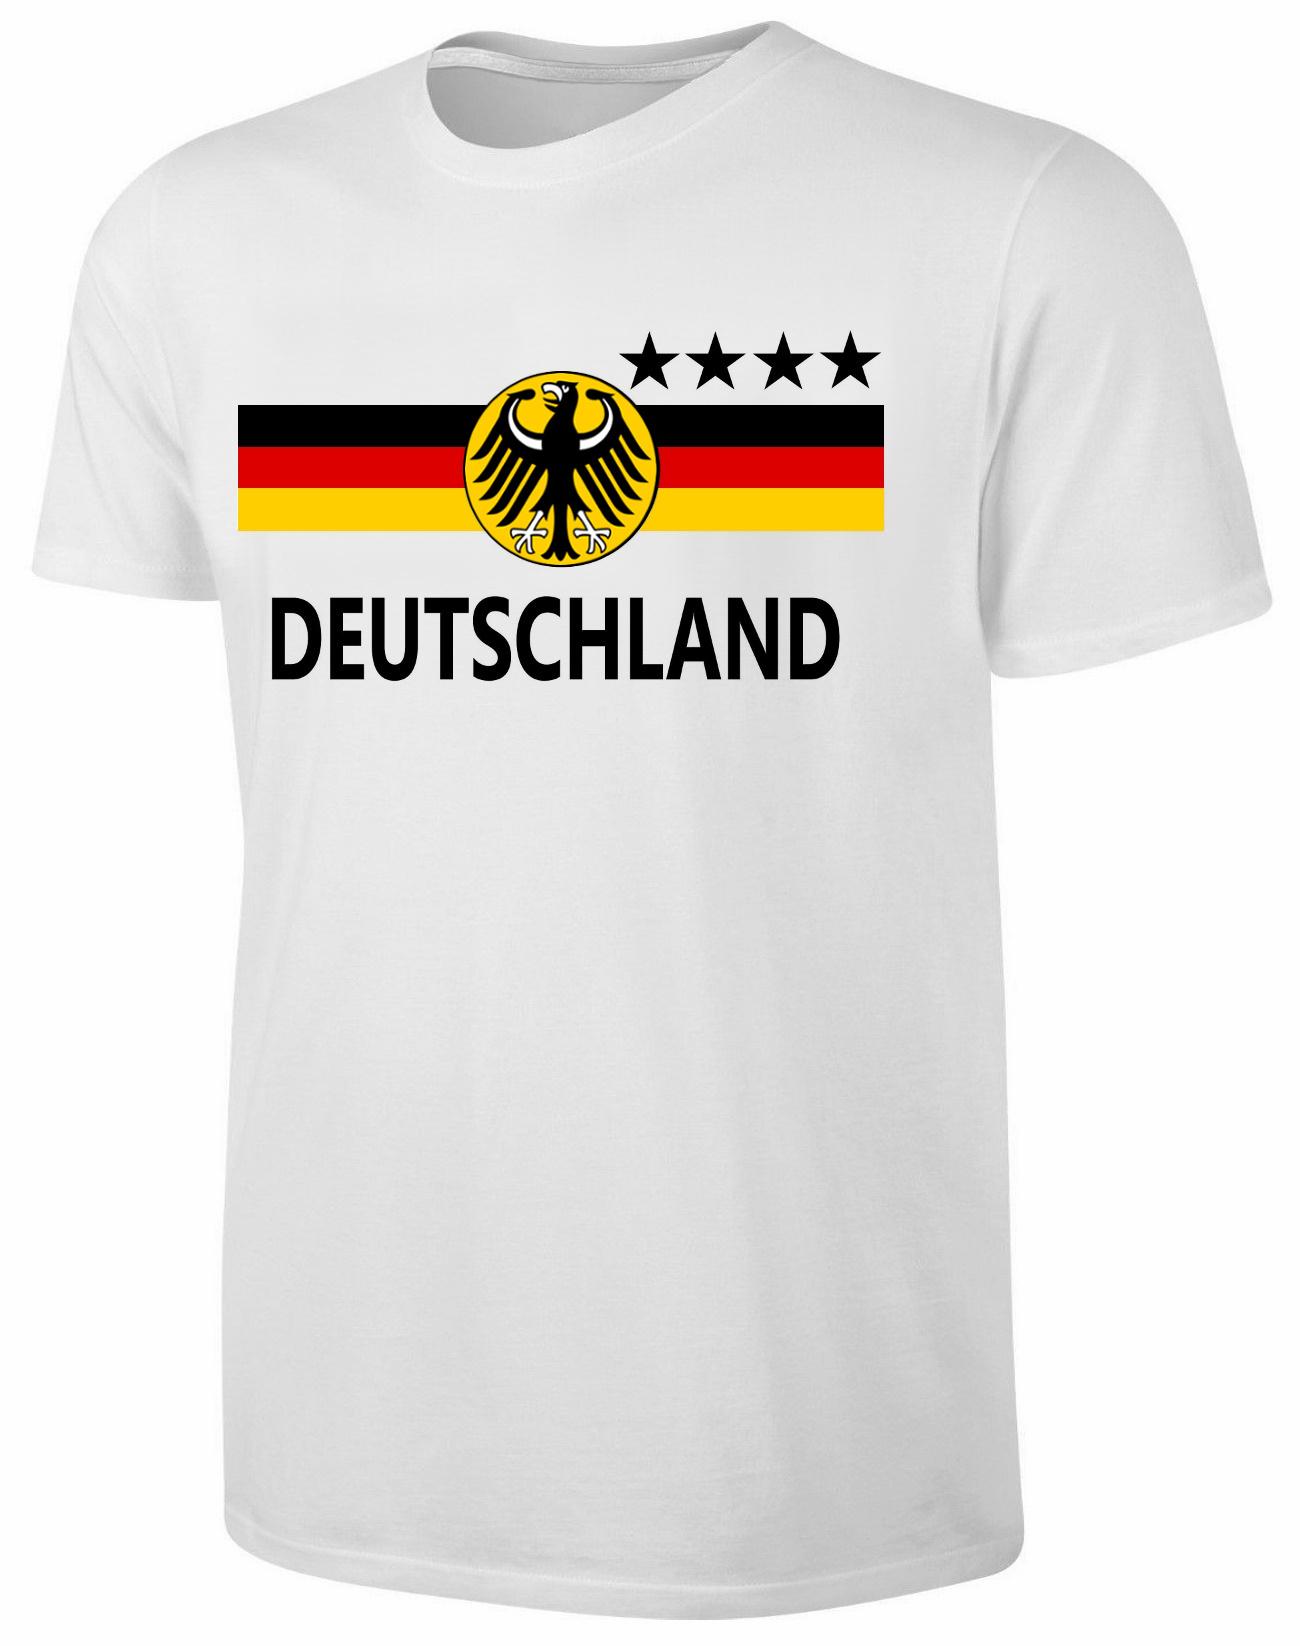 deutschland t shirt kinder fu ball fan shirt wei ebay. Black Bedroom Furniture Sets. Home Design Ideas